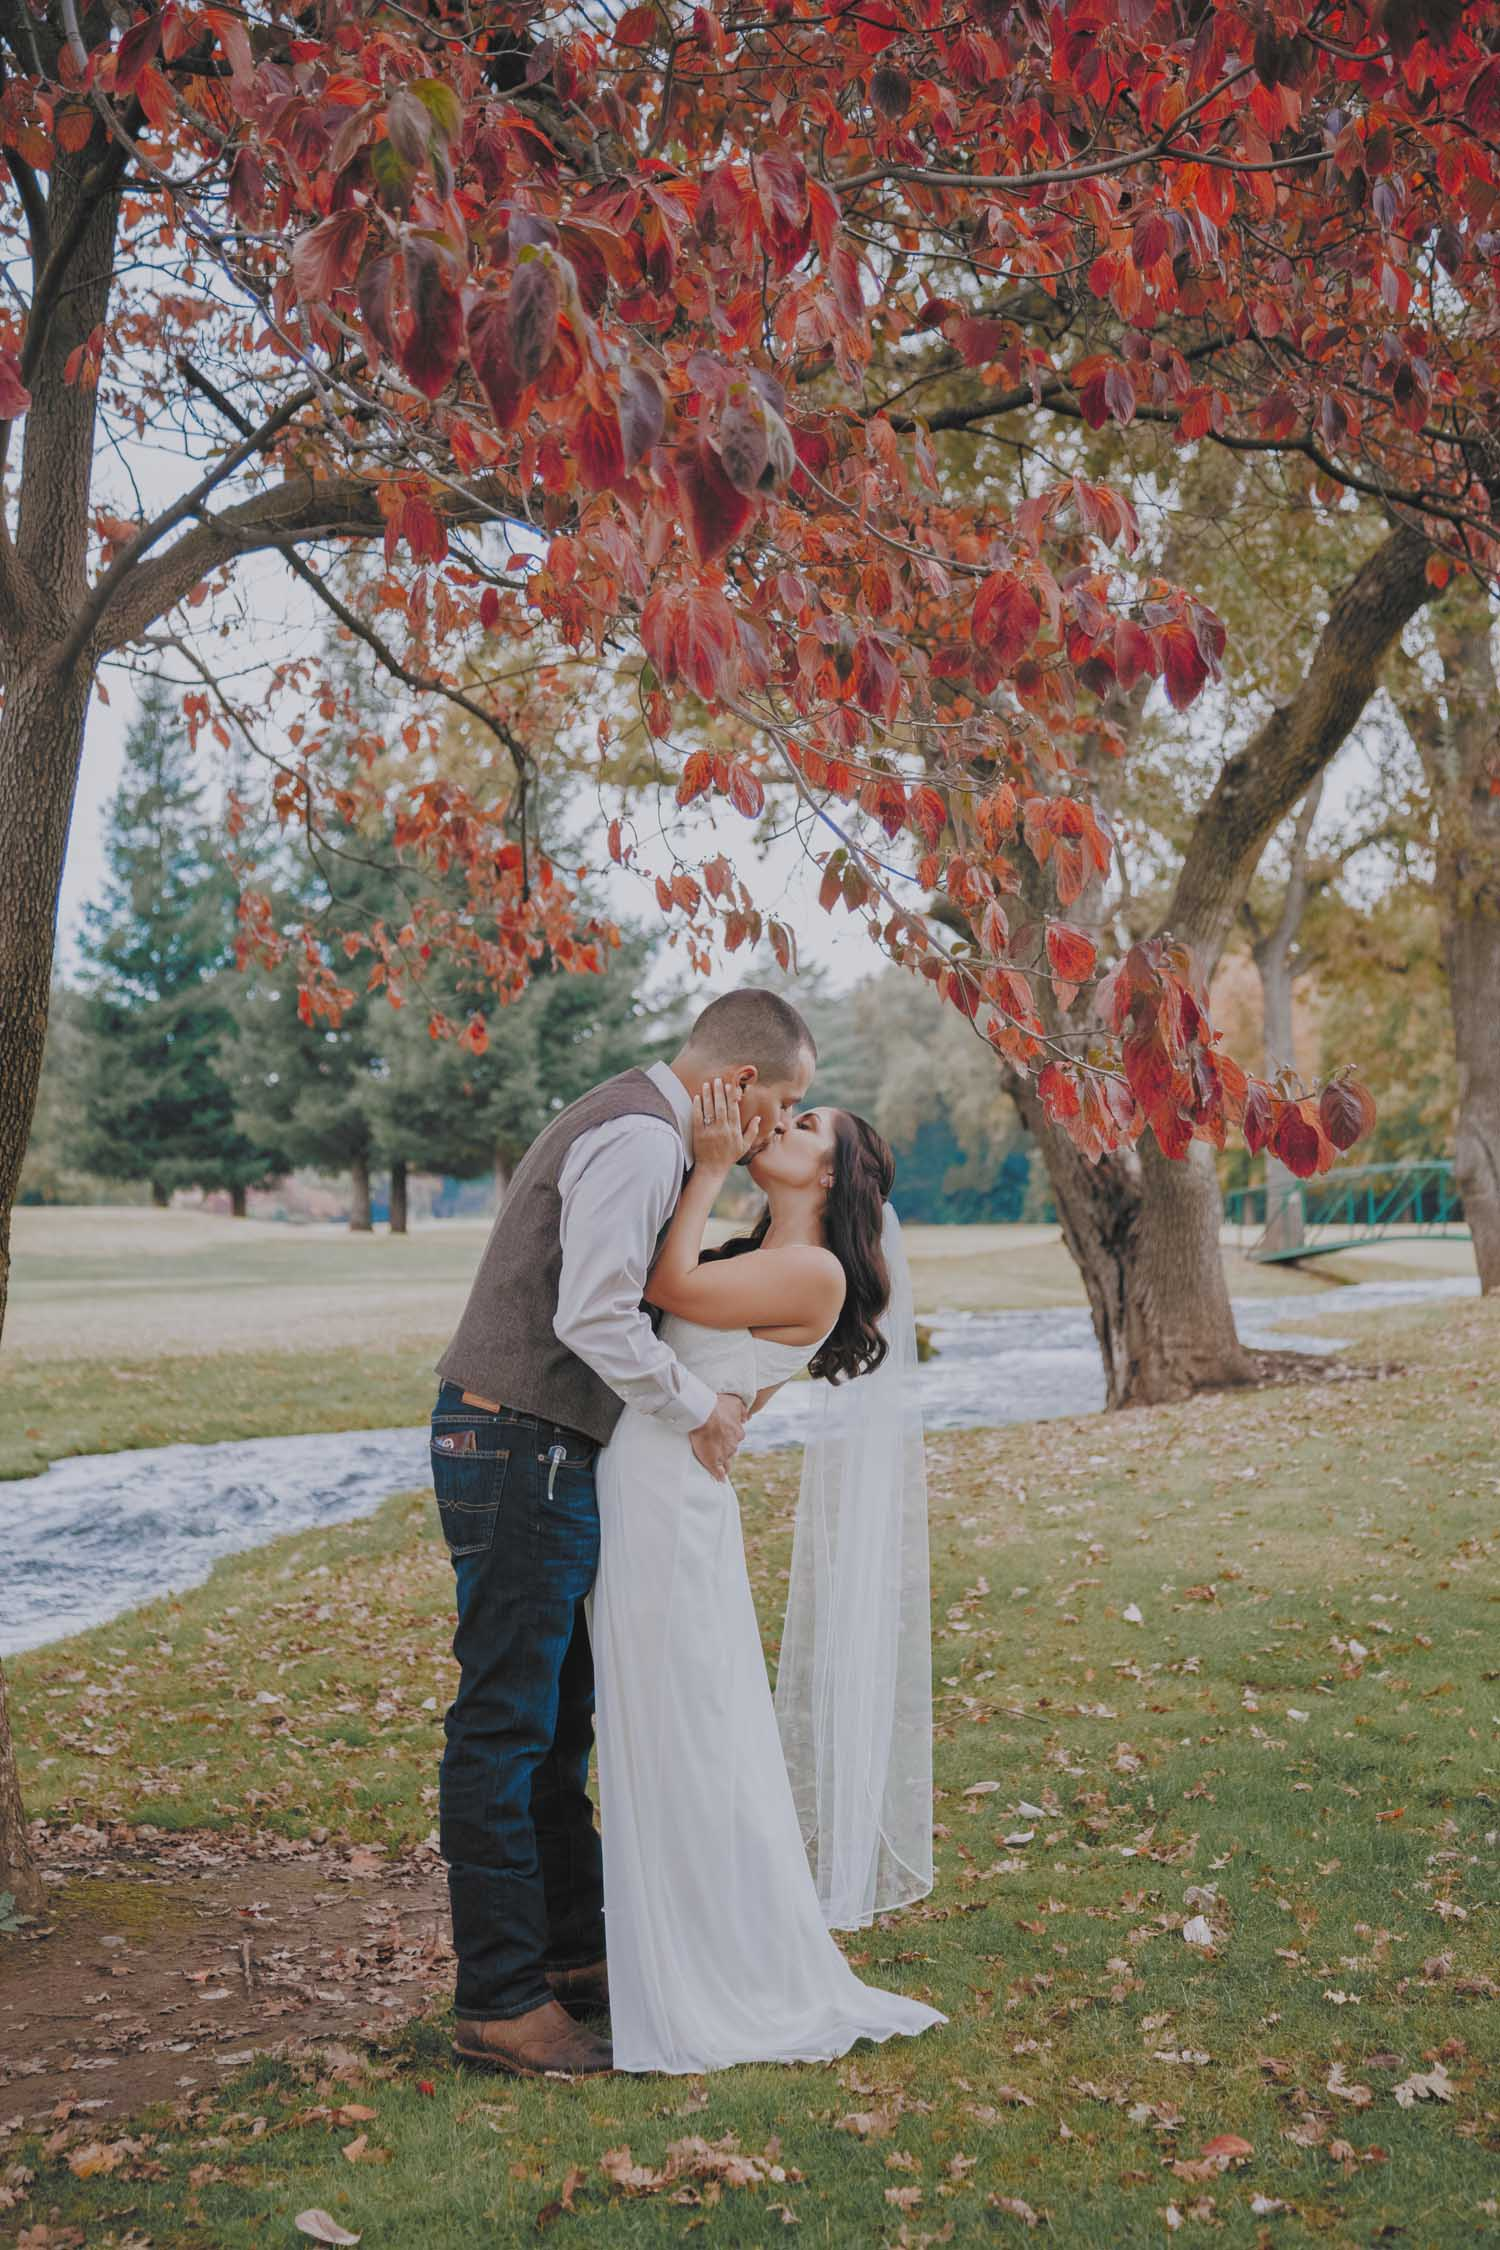 Bonnie-Scott-Rustic-Wedding-Chico-Ca-Butte-Creek-Country-Club131-2.jpg